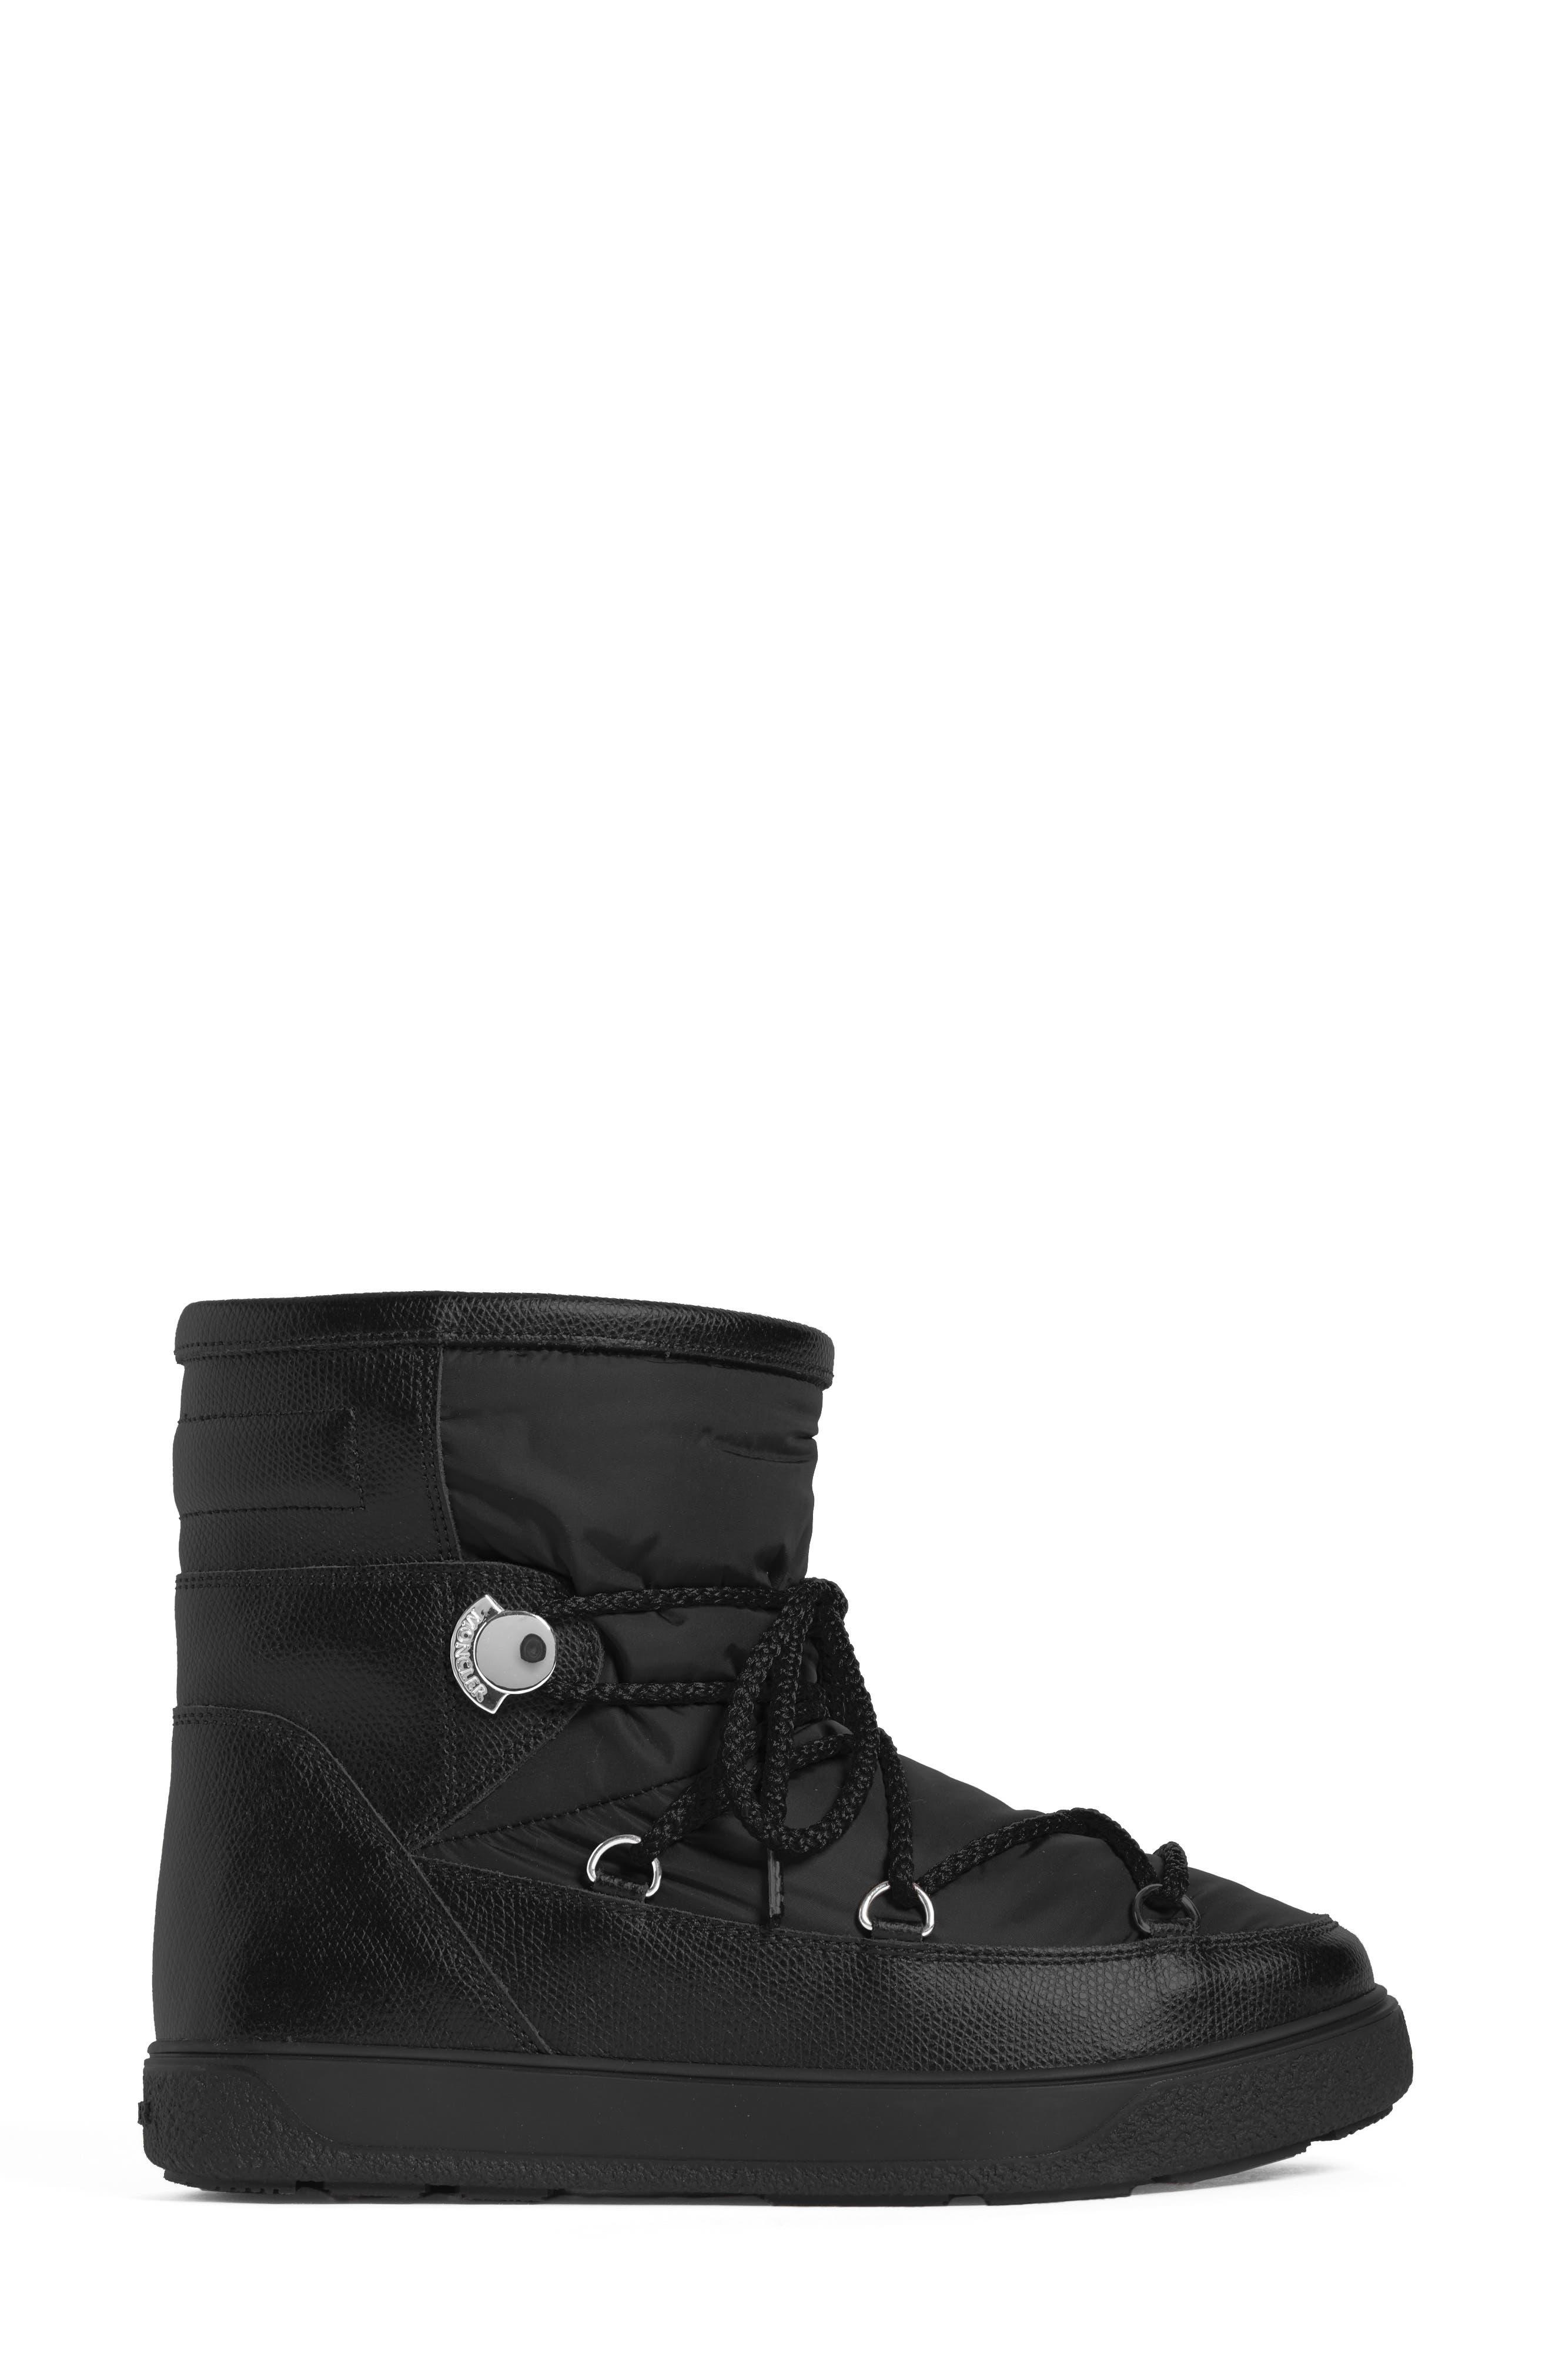 New Fanny Stivale Short Boots,                             Alternate thumbnail 3, color,                             001